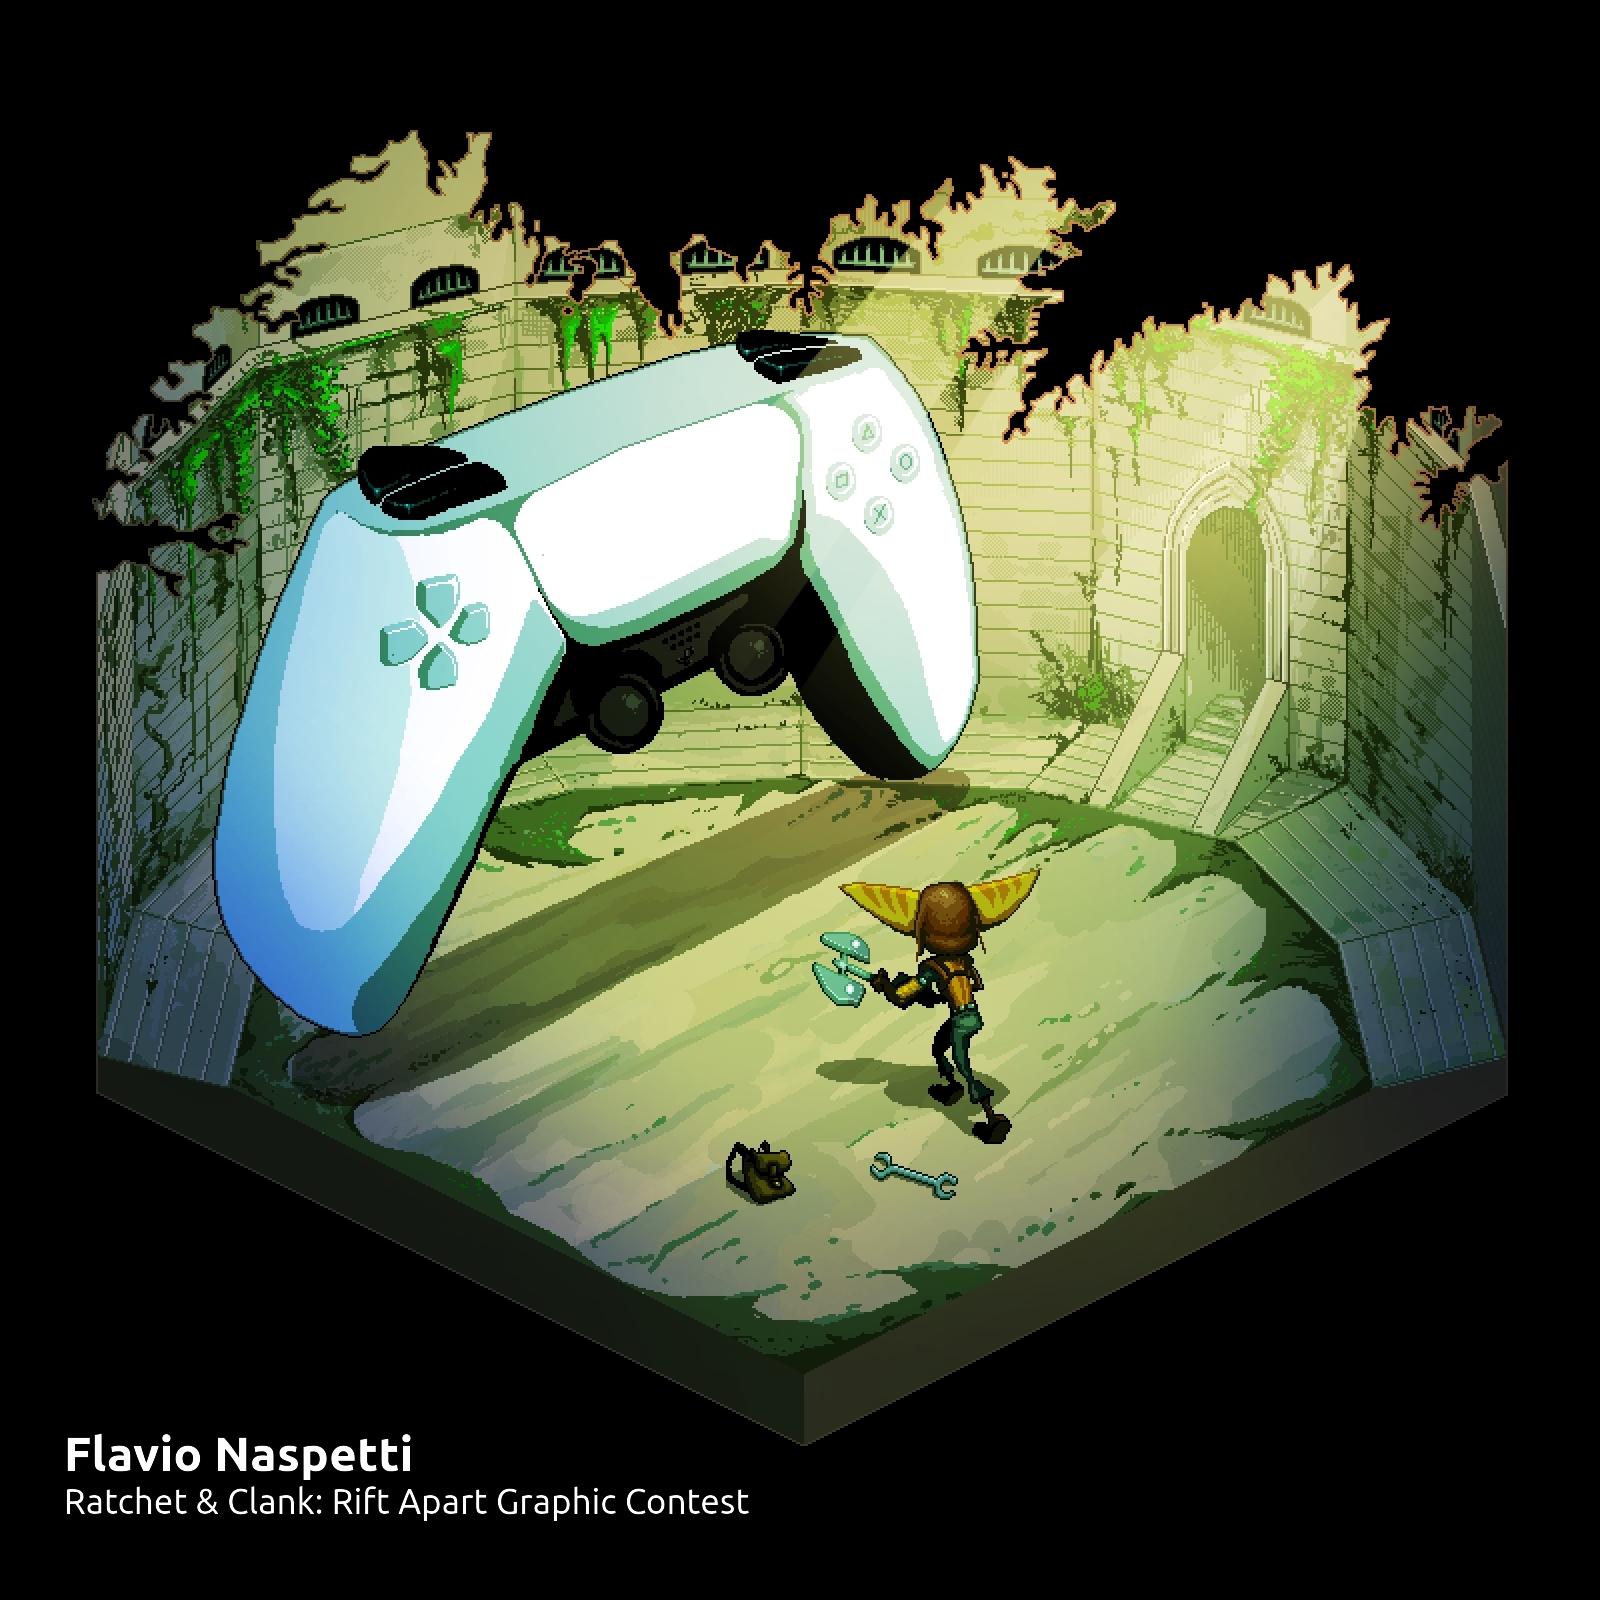 Ratchet & Clank: Rift Apart Graphic Contest, Premio Pixelart